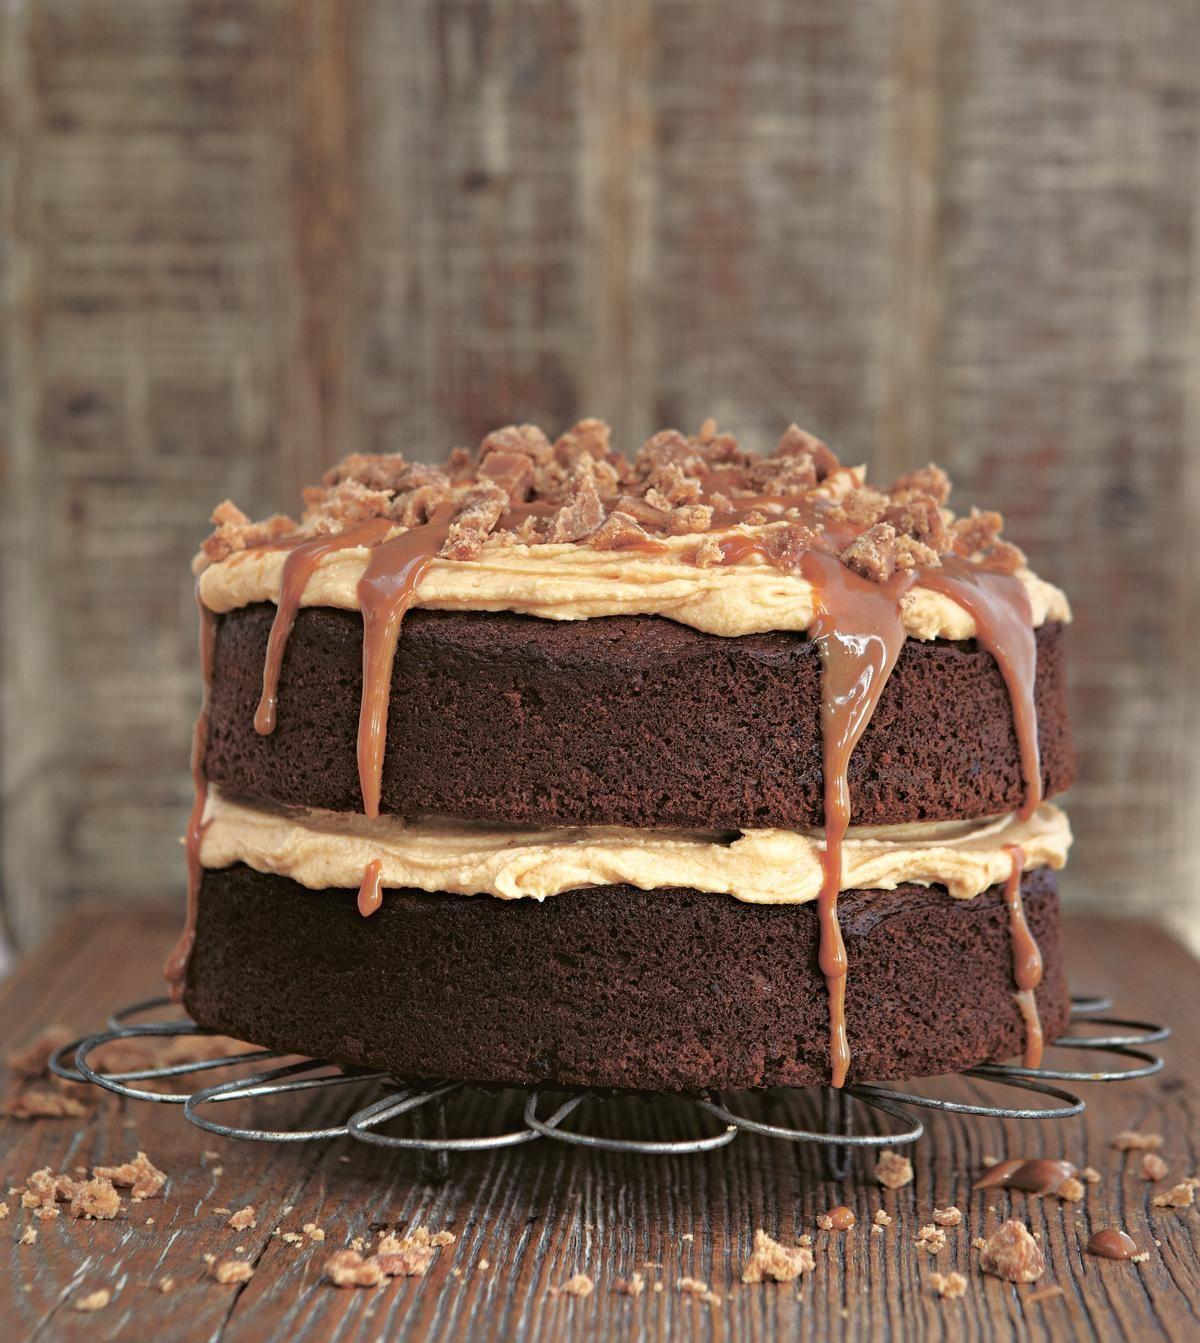 Sticky Toffee Cake Gloriously Sticky Toffee Cake - The Happy FoodieGloriously Sticky Toffee Cake - The Happy Foodie